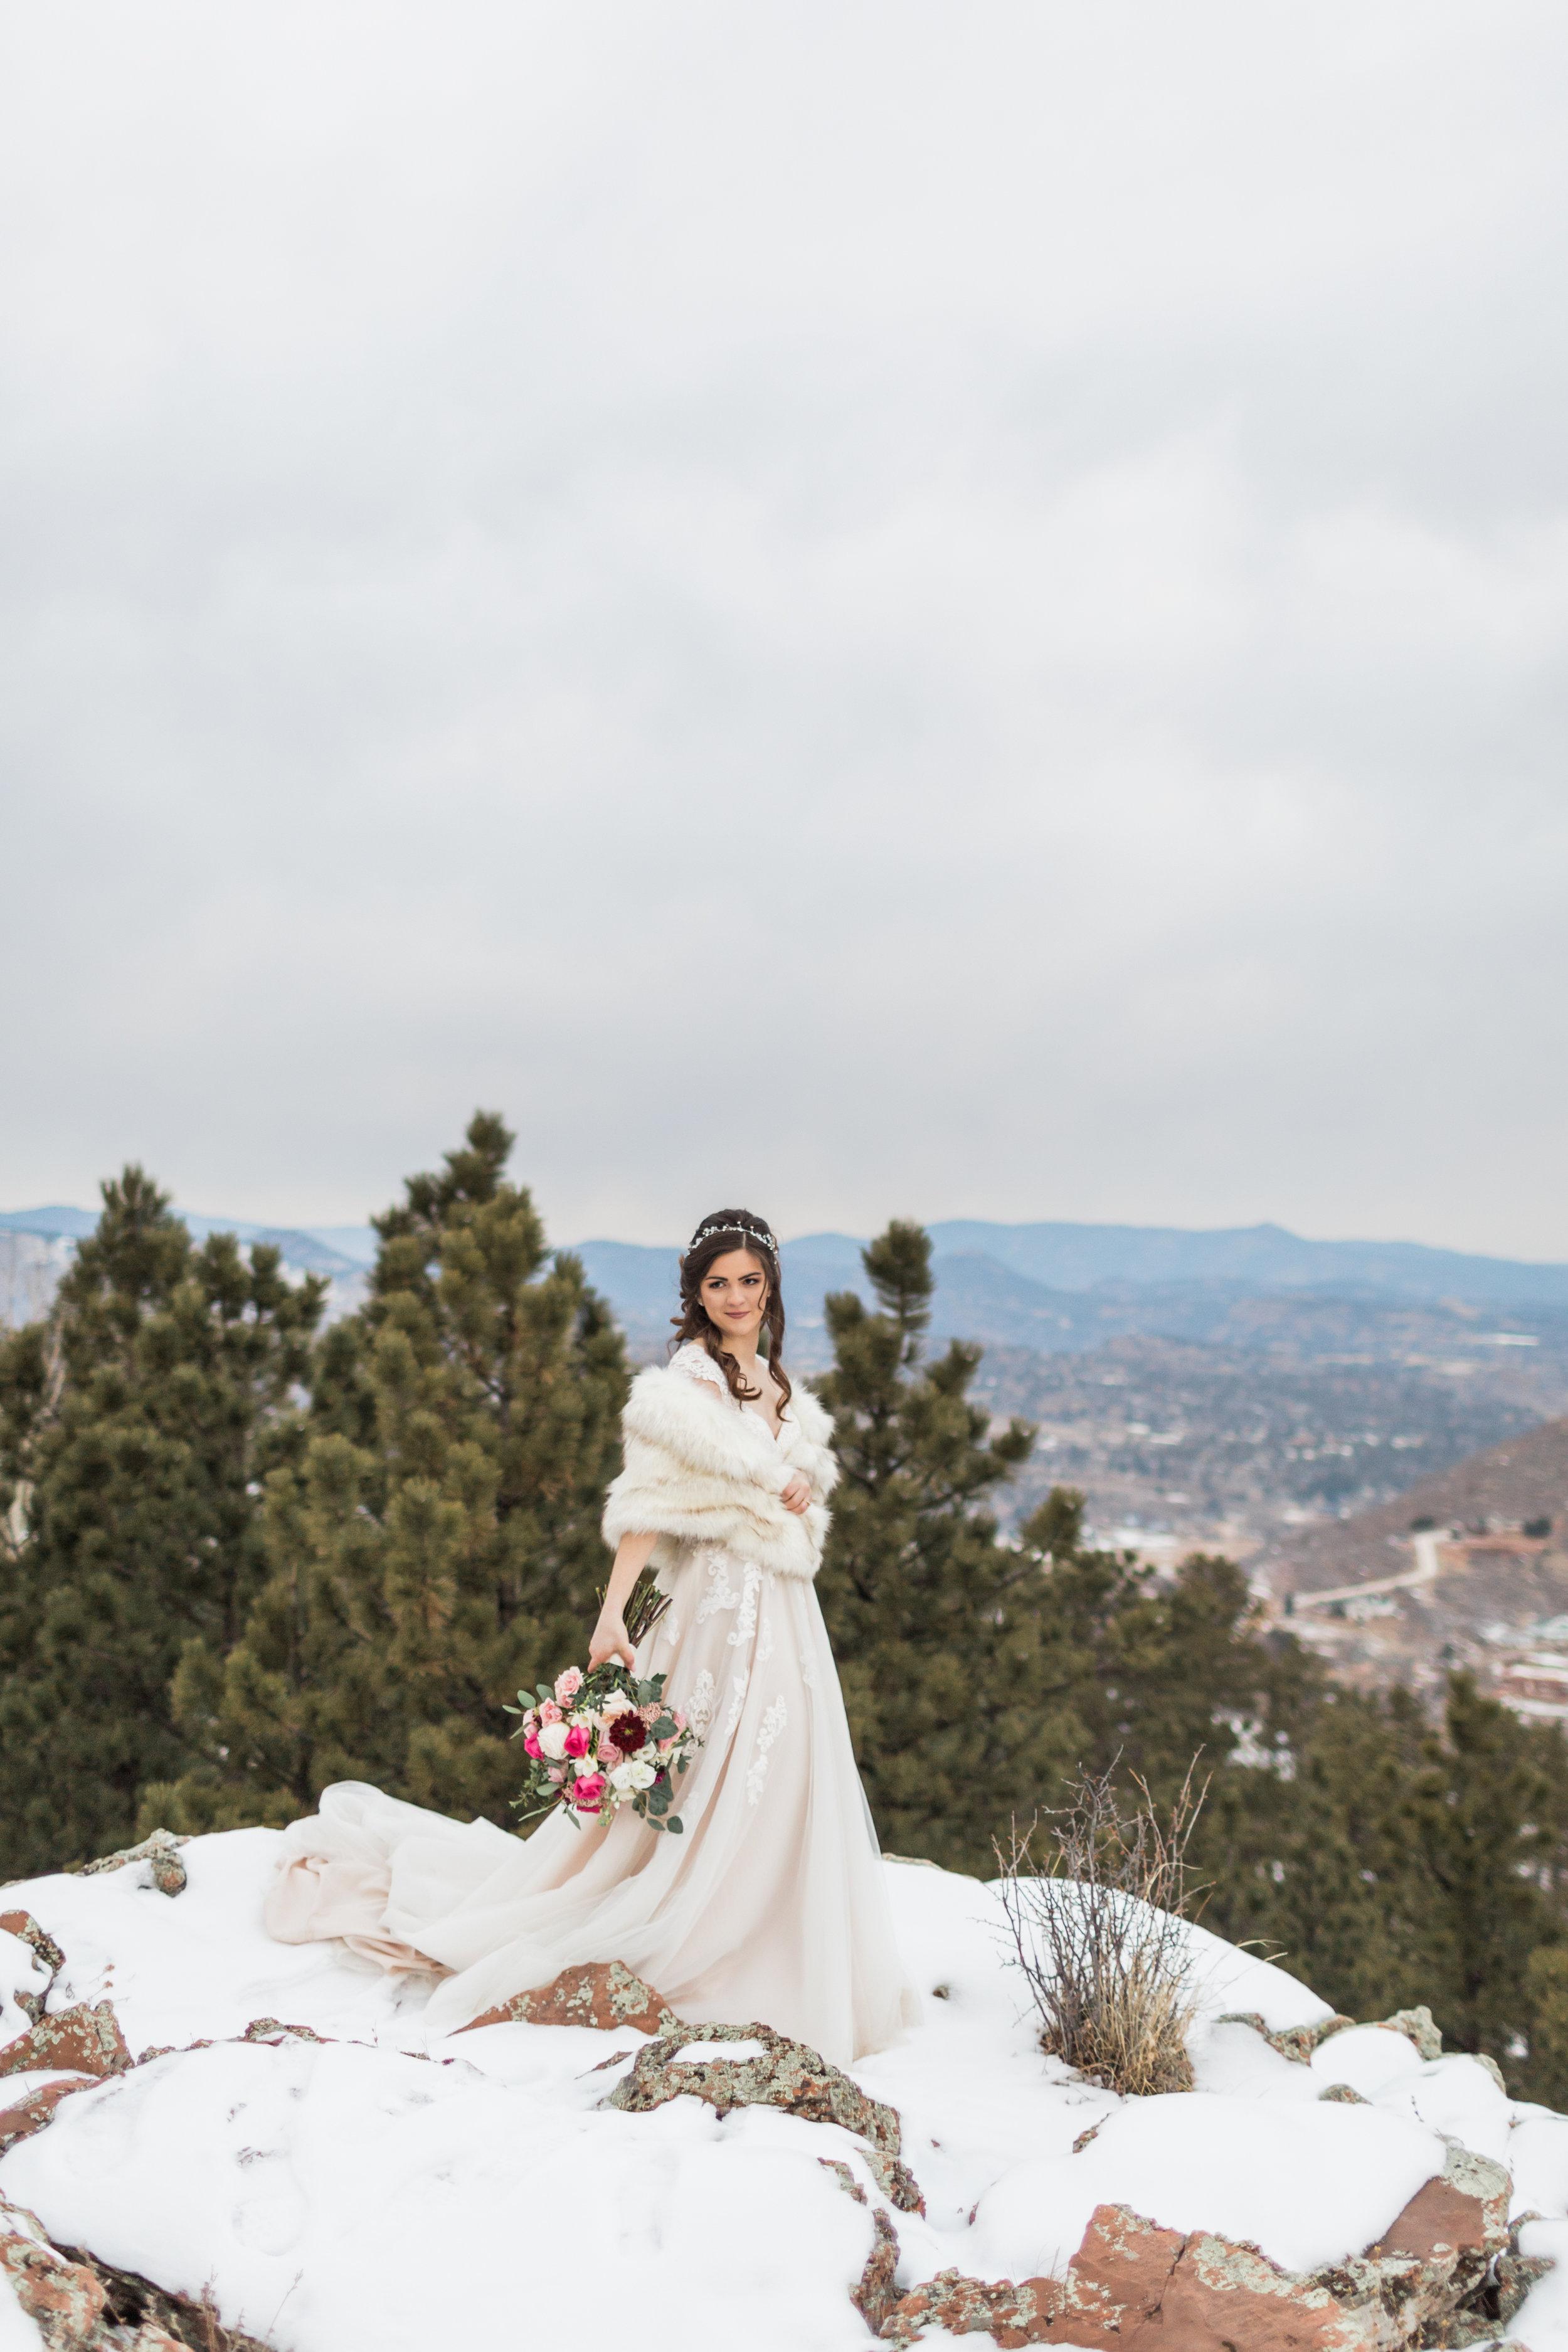 romanticcoloradodestinationwedding-43.jpg